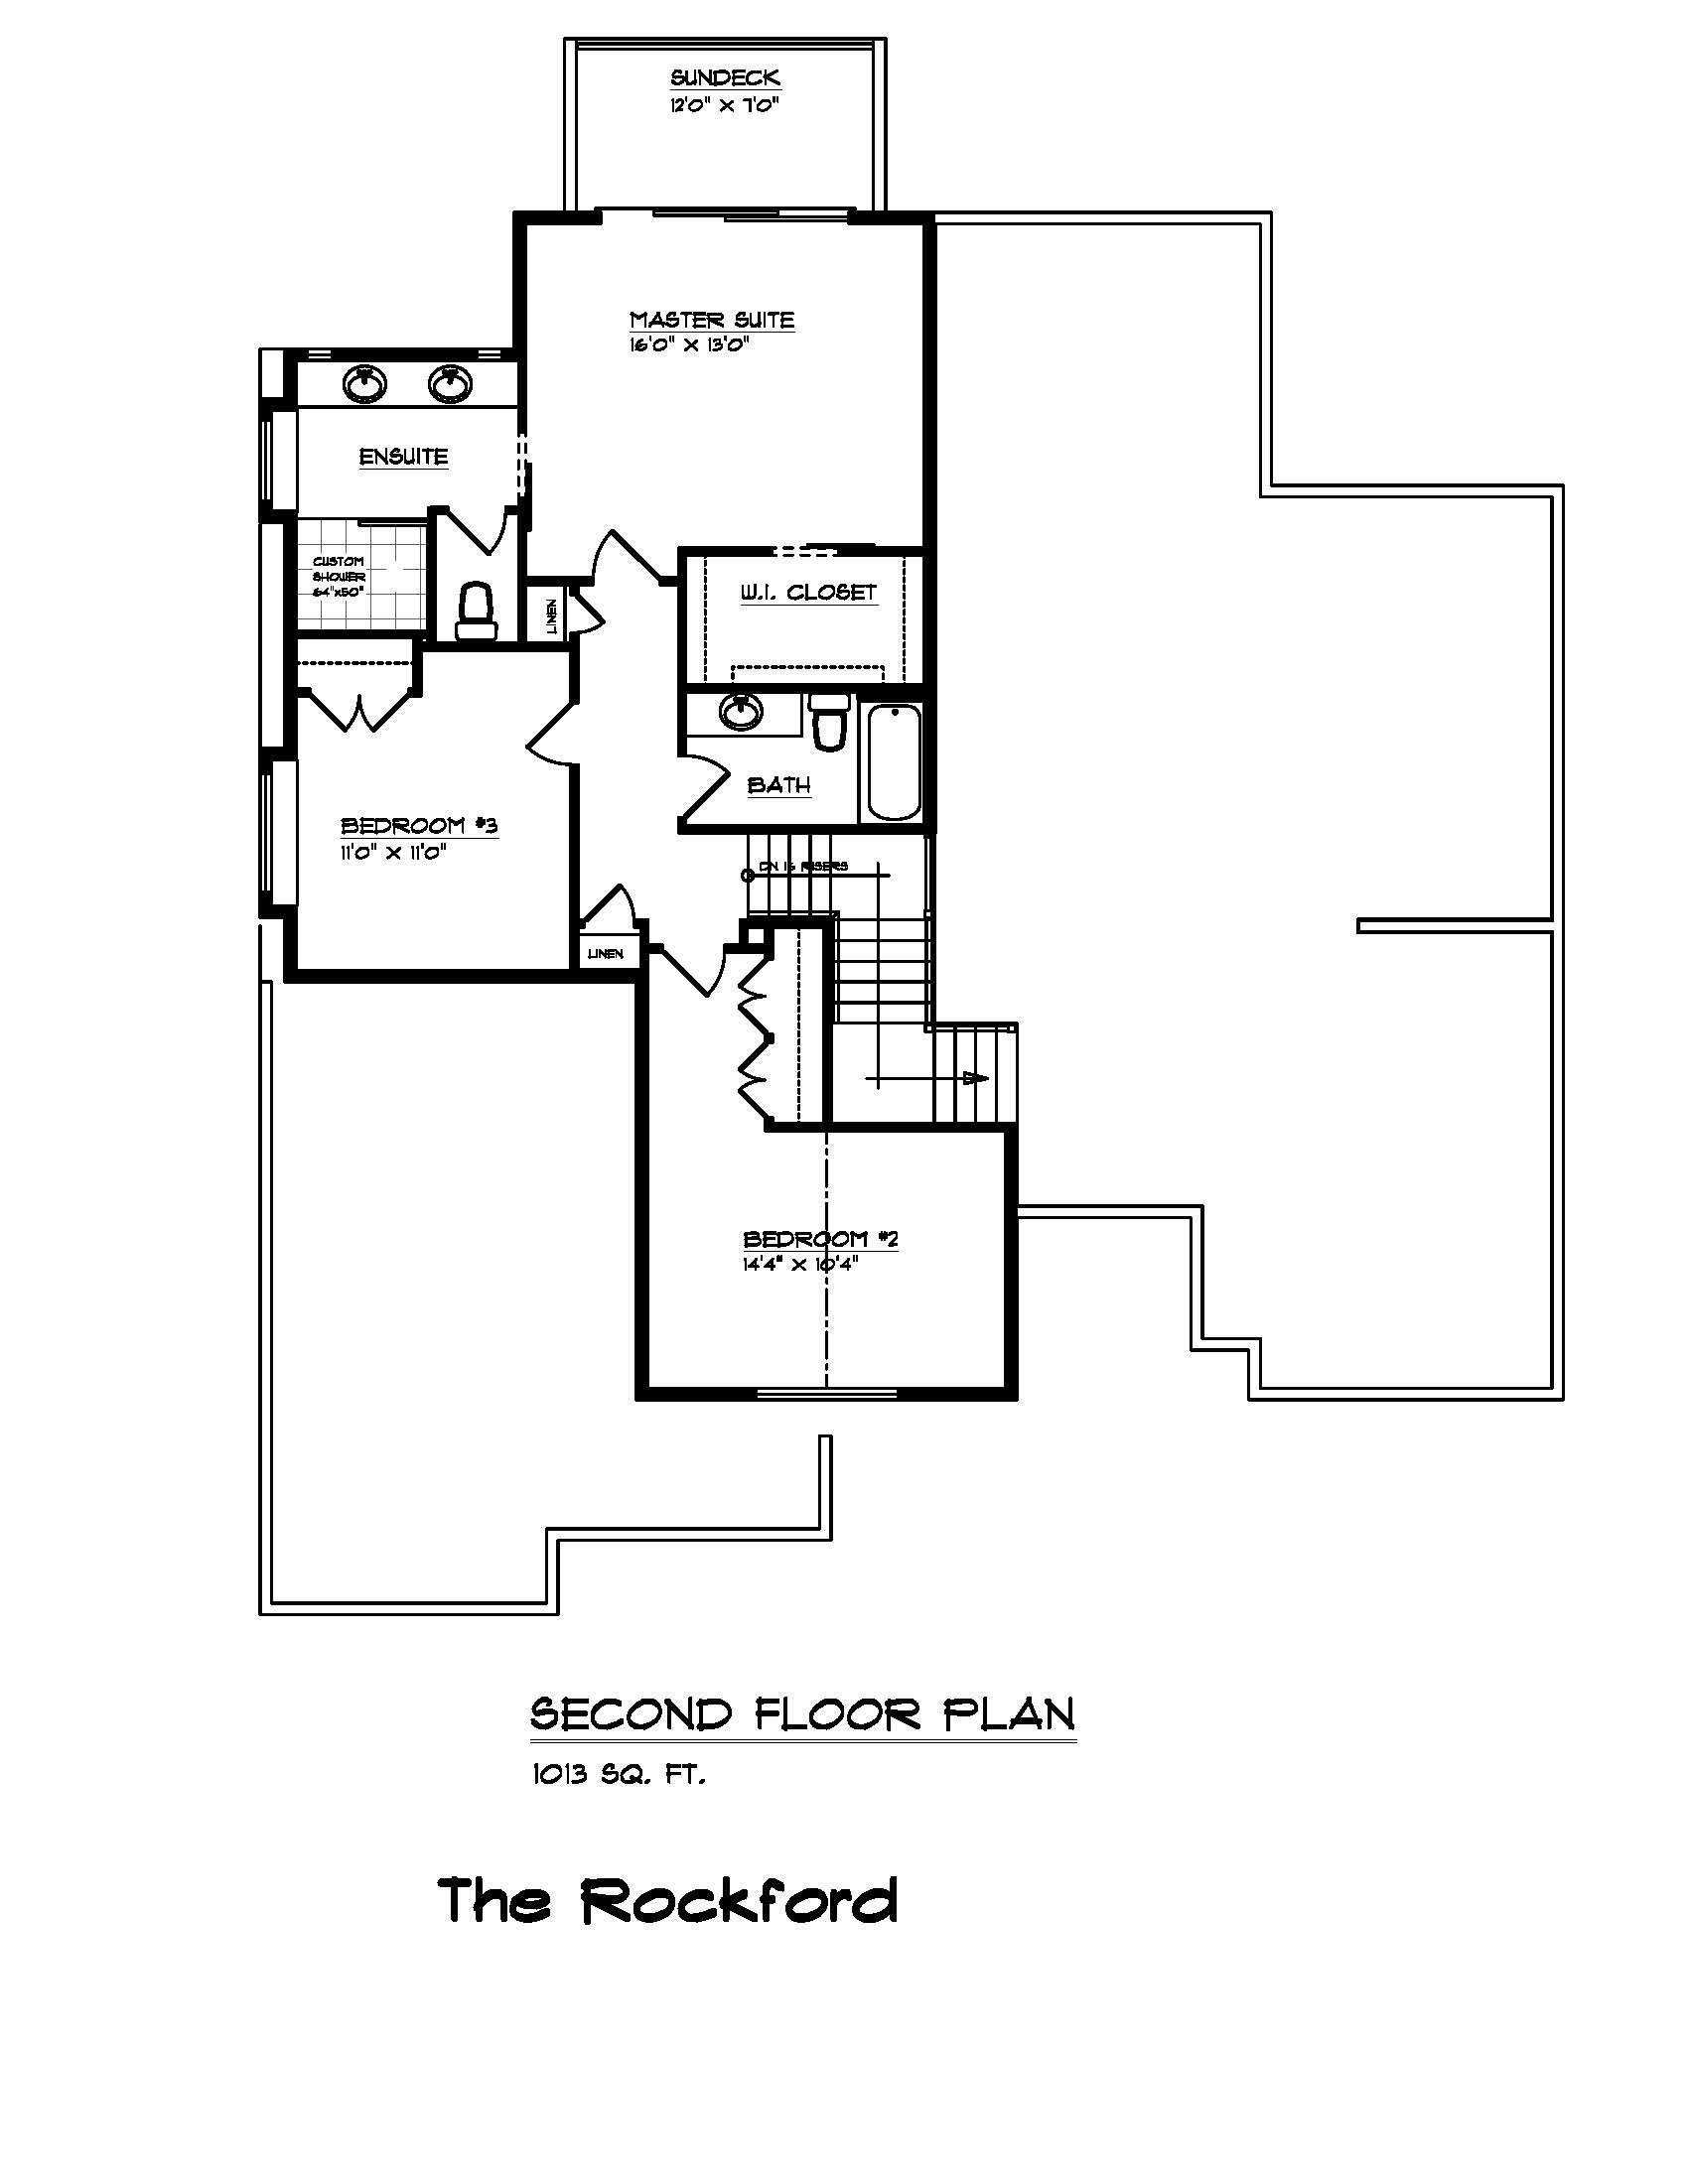 The Rockford - Custom Home Floor Plan 3